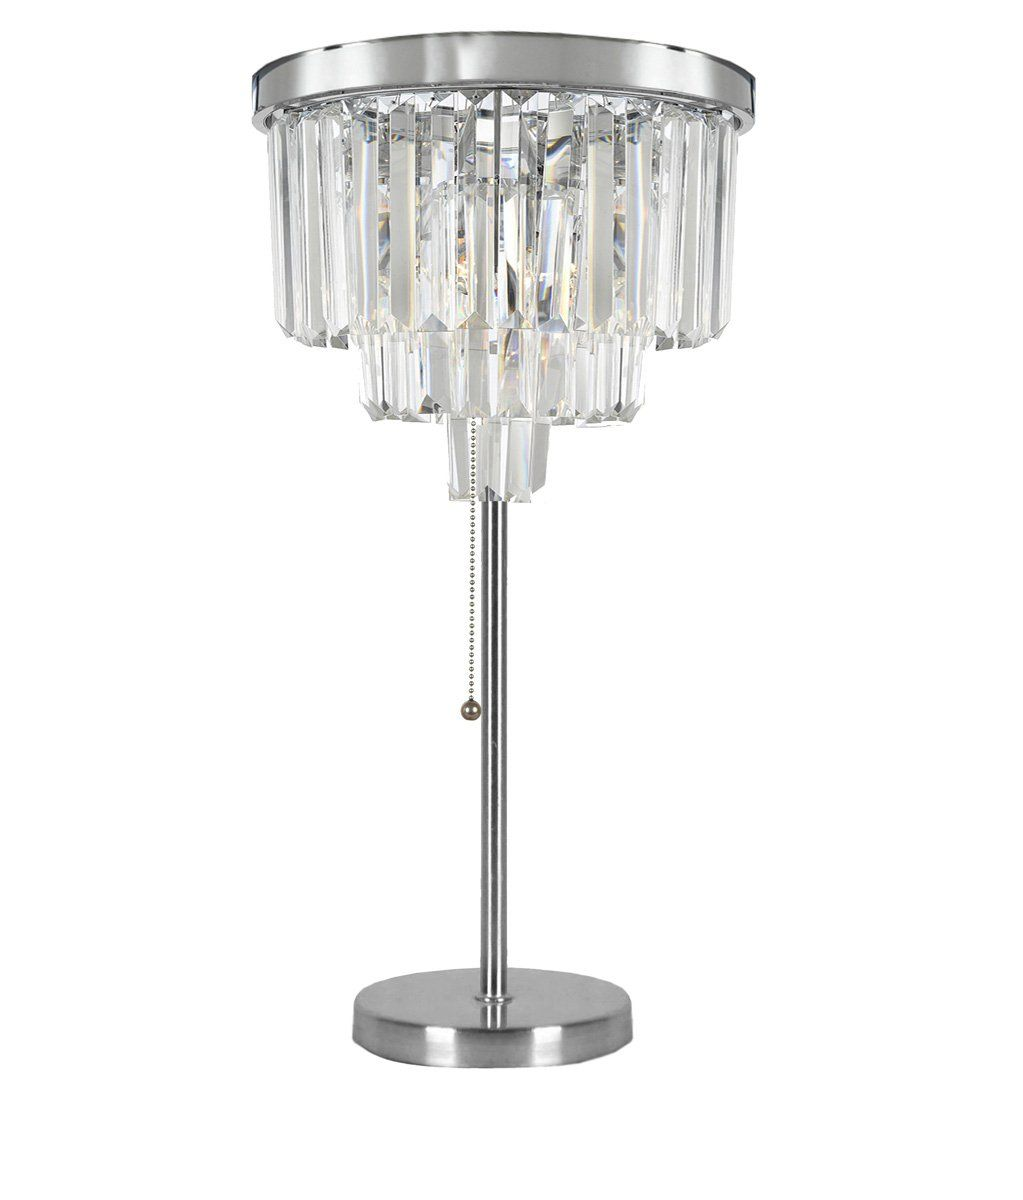 Odeon Empress Crystal Tm Glass Fringe 3 Tier Table Lamp Lighting H 32 W14 Lightfixtures Lighting Decor Lights R Buffet Table Lamps Lamp Chrome Lamp